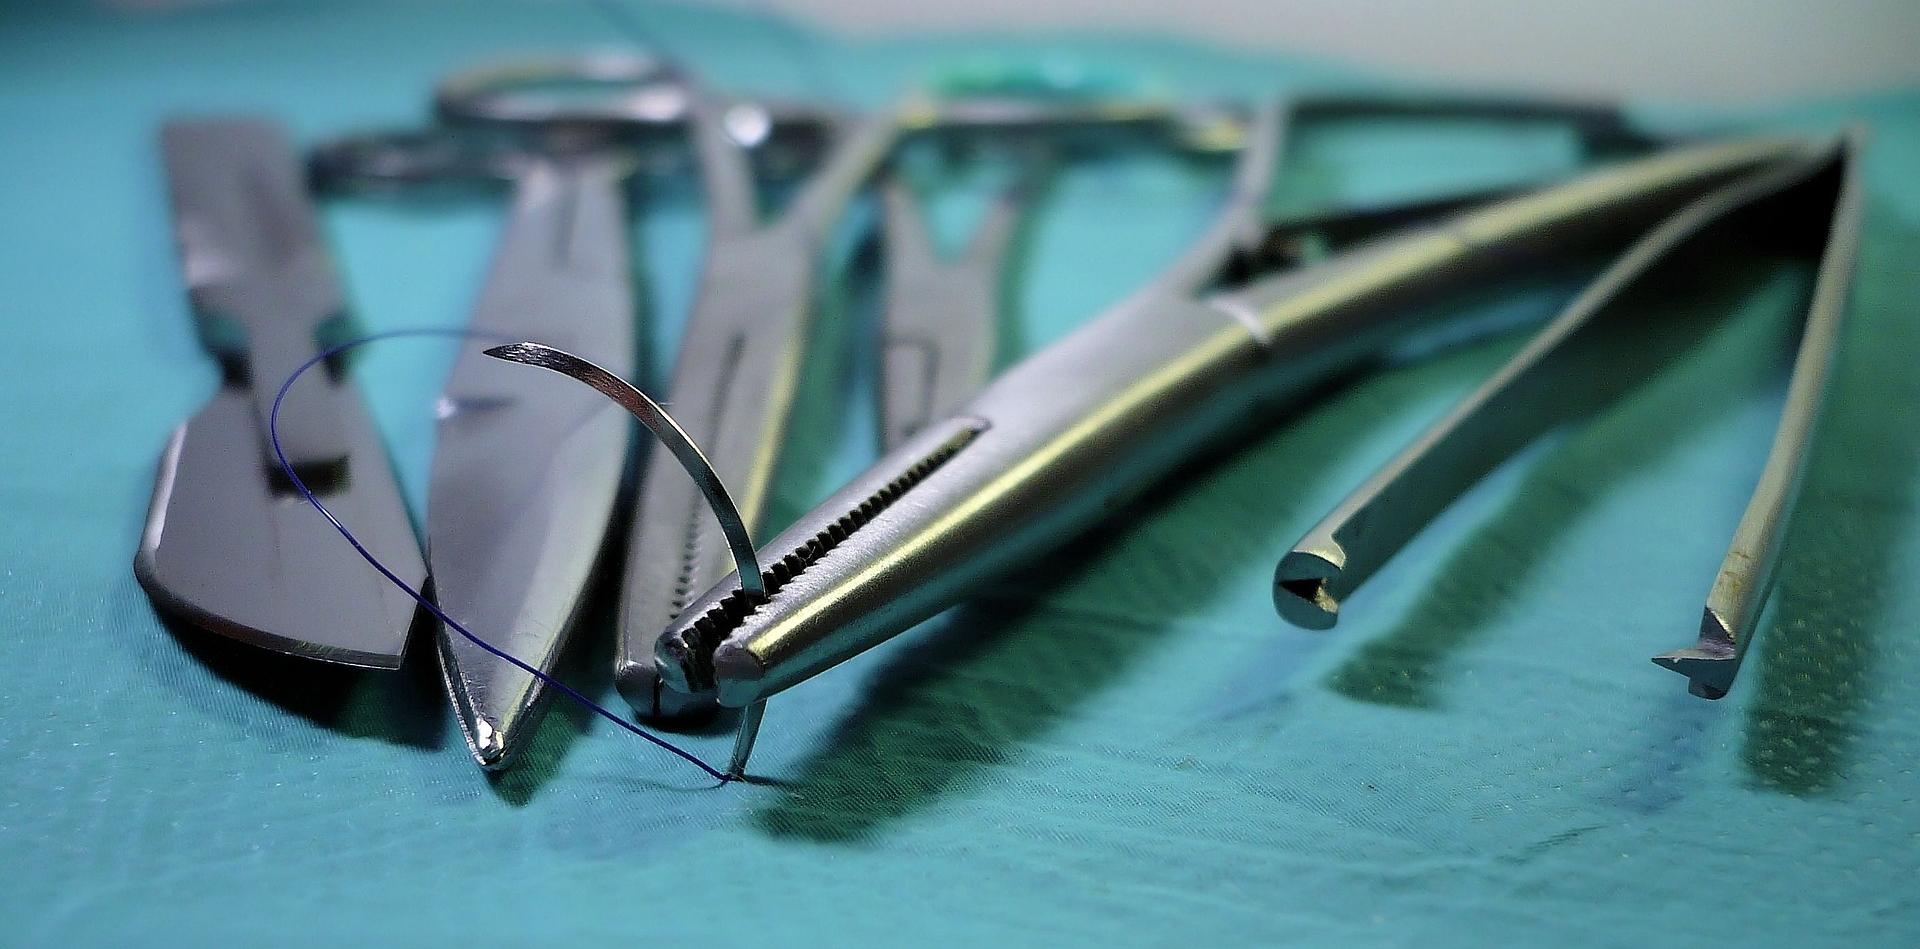 surgery-1662204_1920.jpg